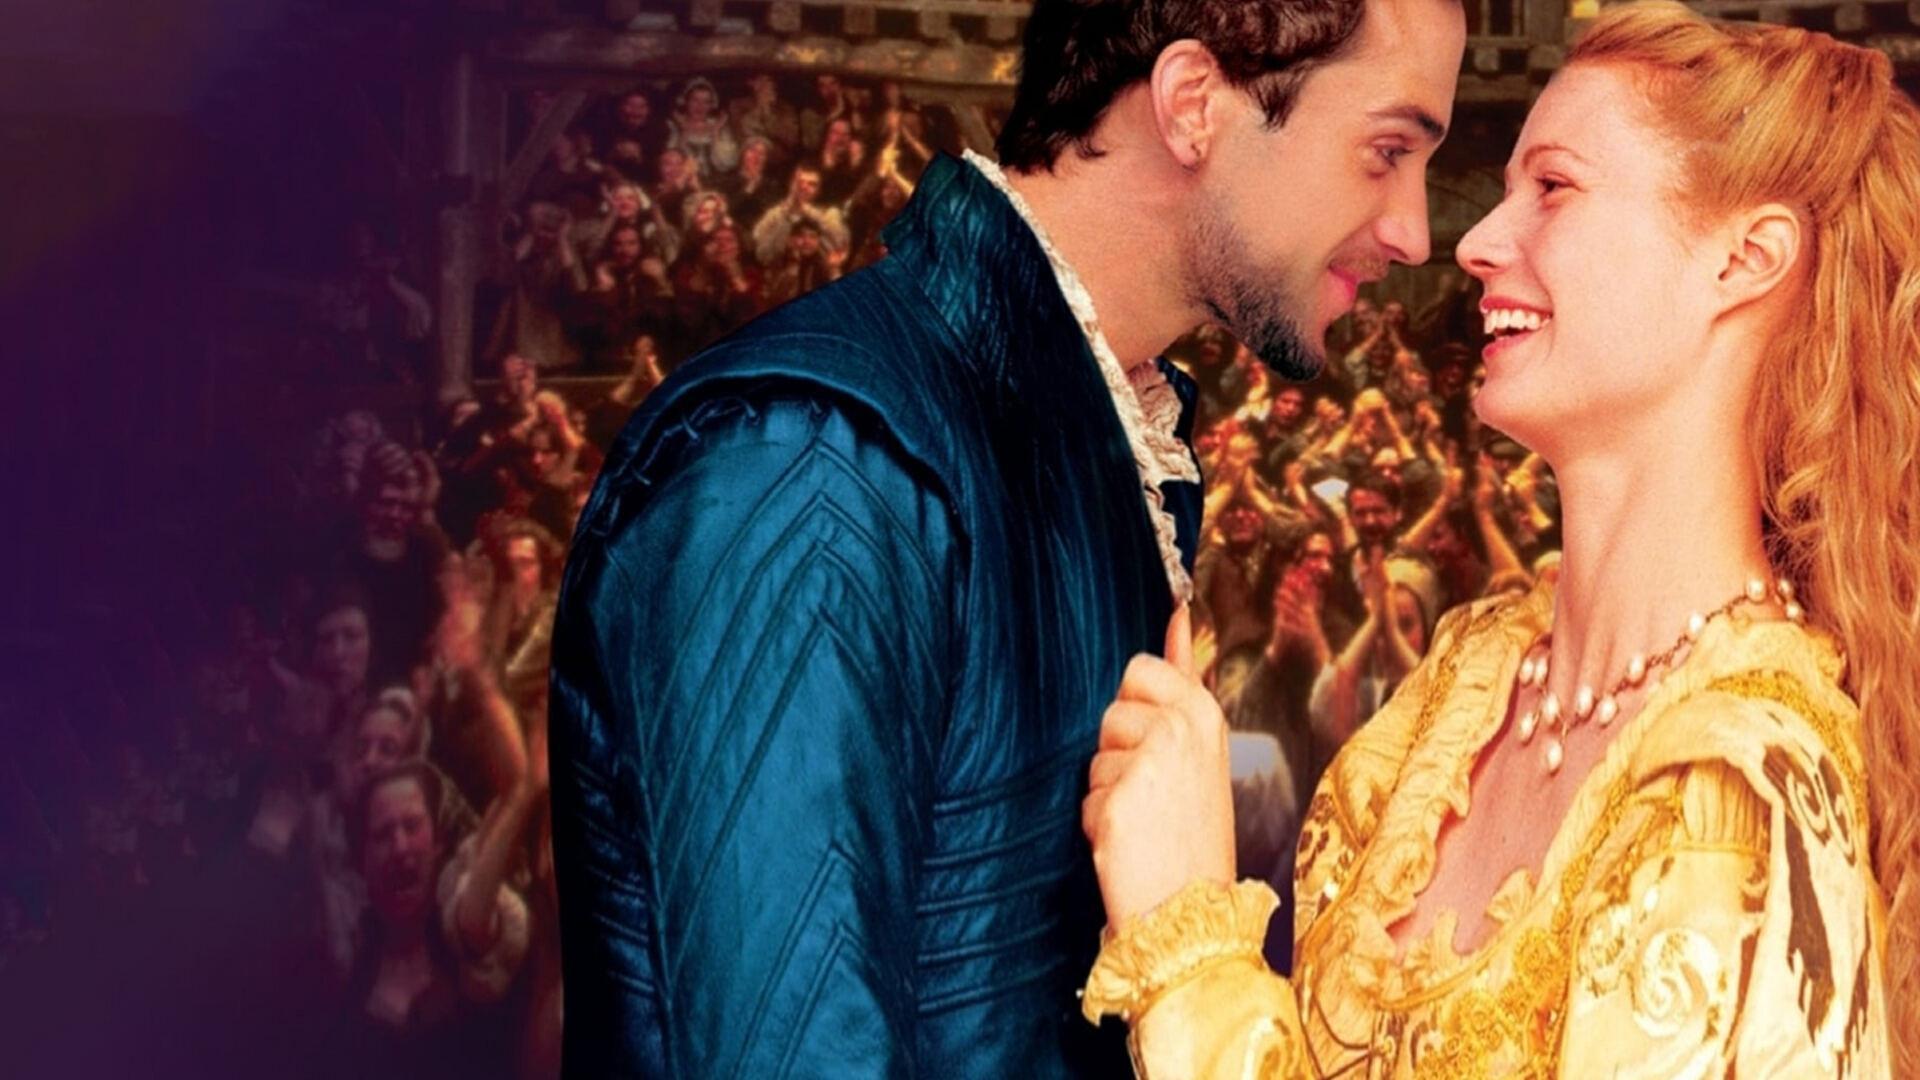 Premium Cinema 2 Shakespeare in love